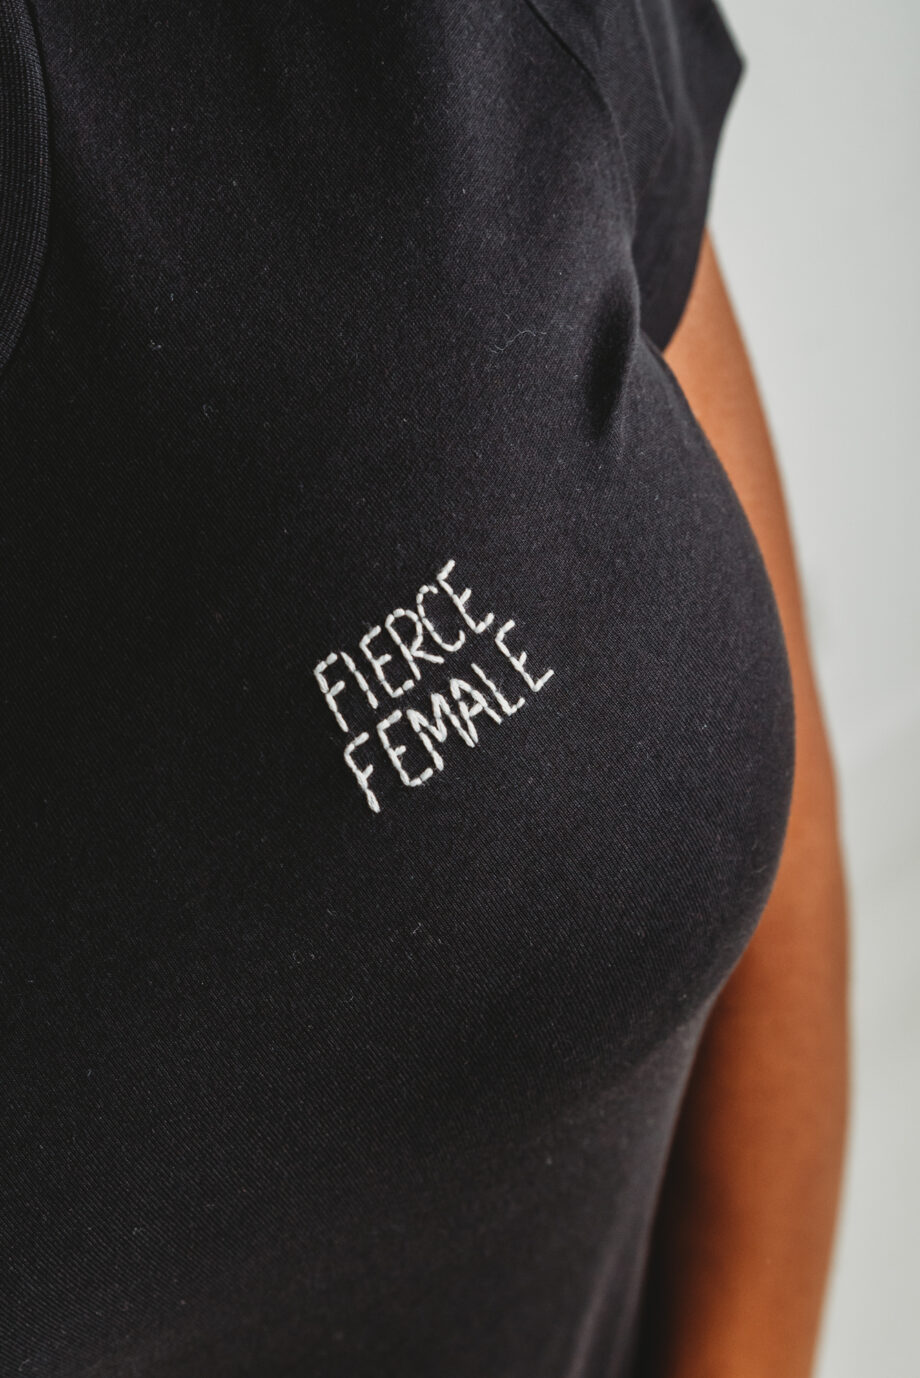 Fierce Female Fuller Bust top